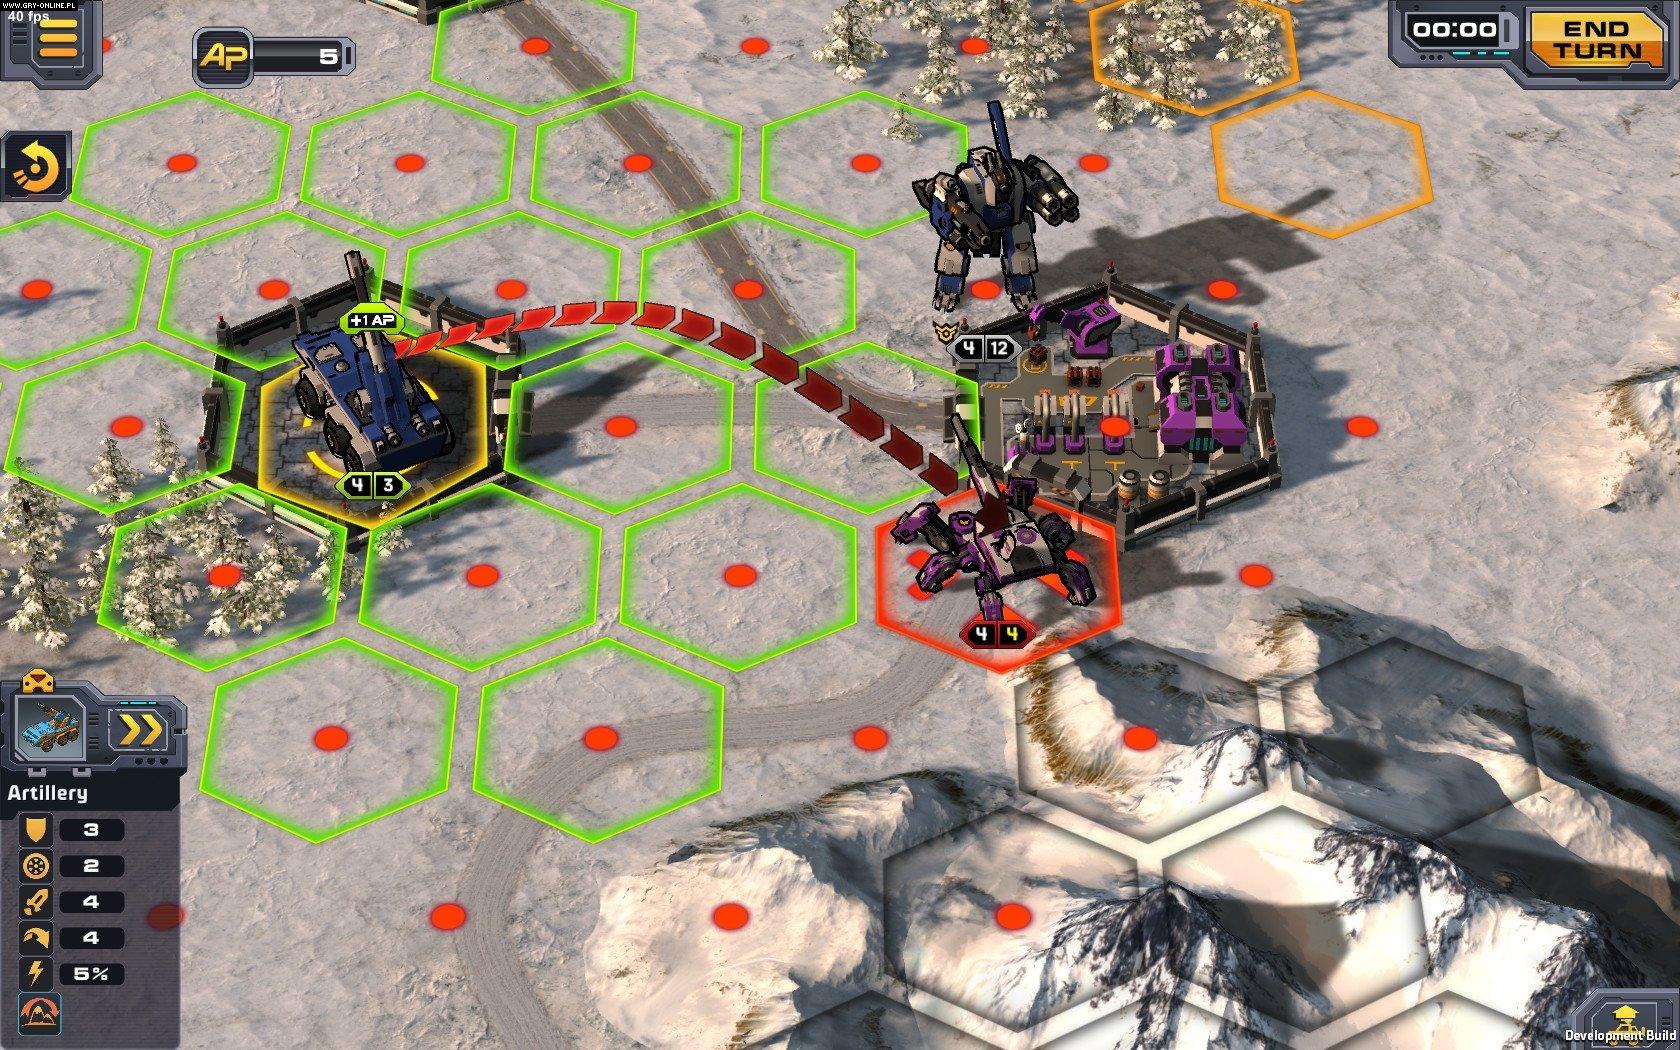 Codex of Victory PC Games Image 3/14, Ino-Co, 1C